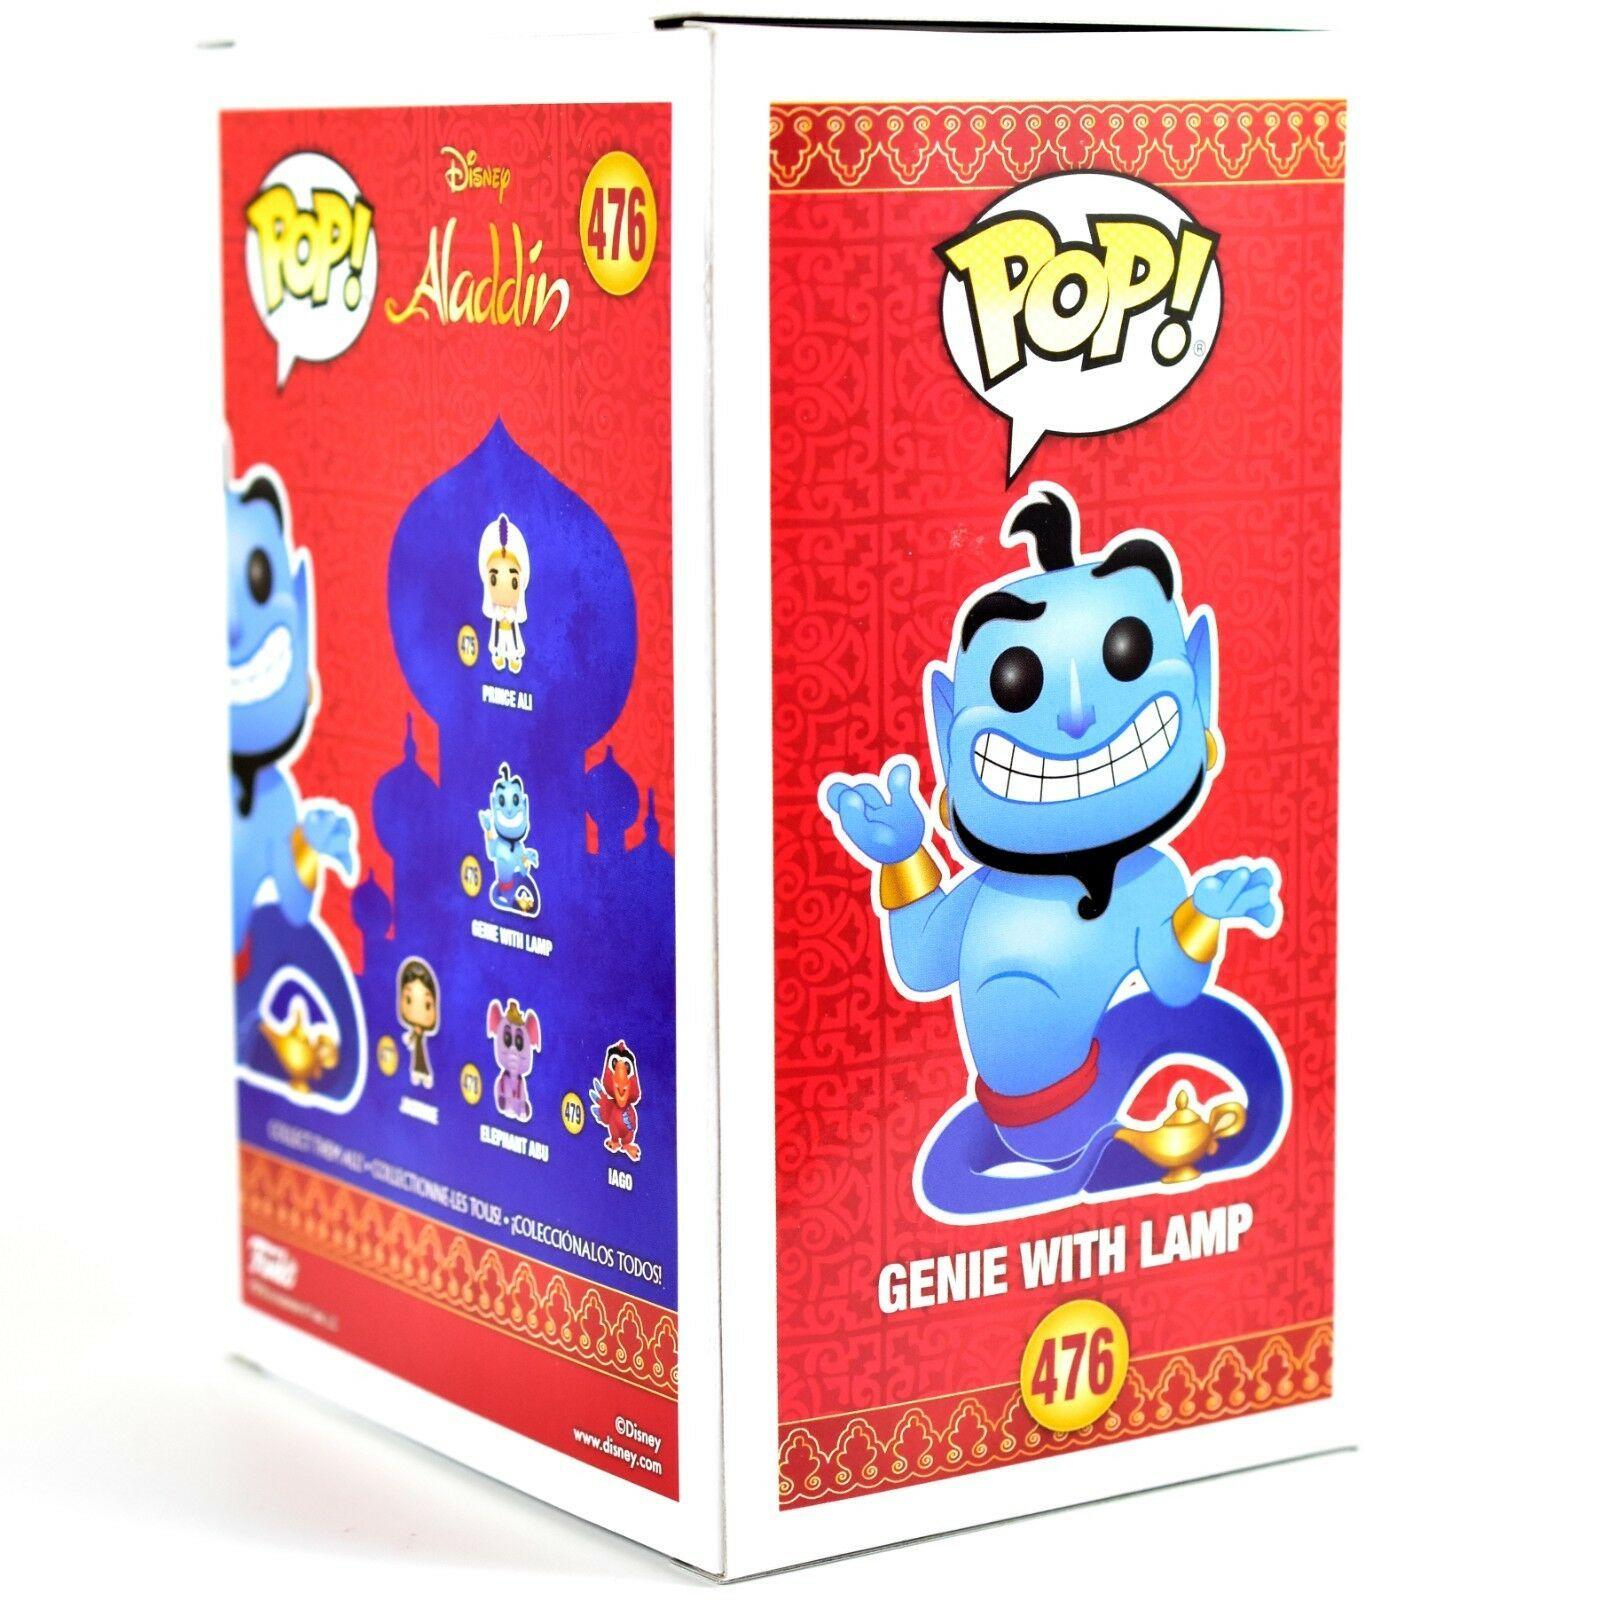 Funko Pop! Disney Aladdin Genie with Lamp #476 Vinyl Action Figure IN STOCK NIB